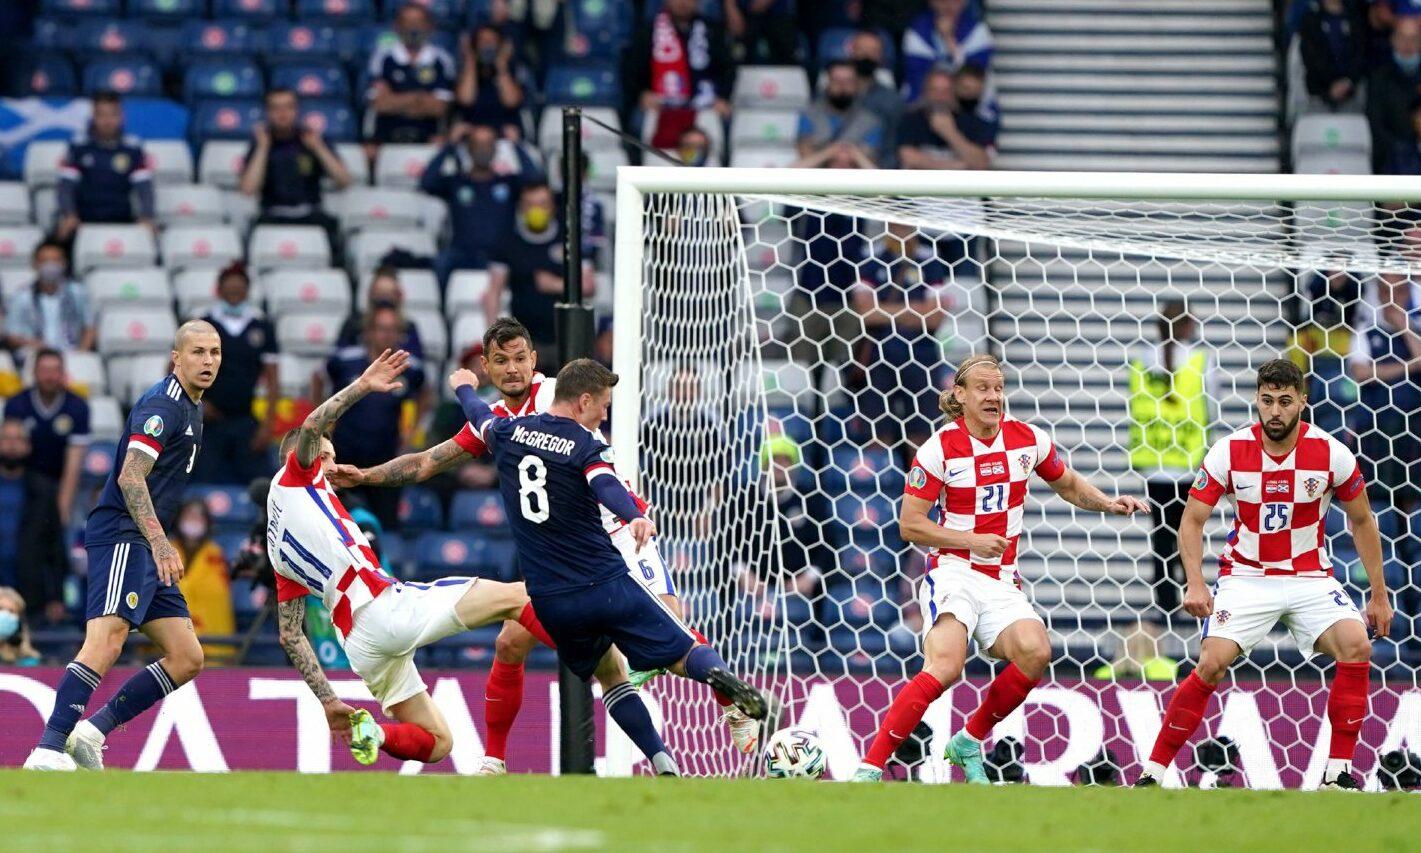 Callum McGregor scores Scotland's first tournament goal since 1998.